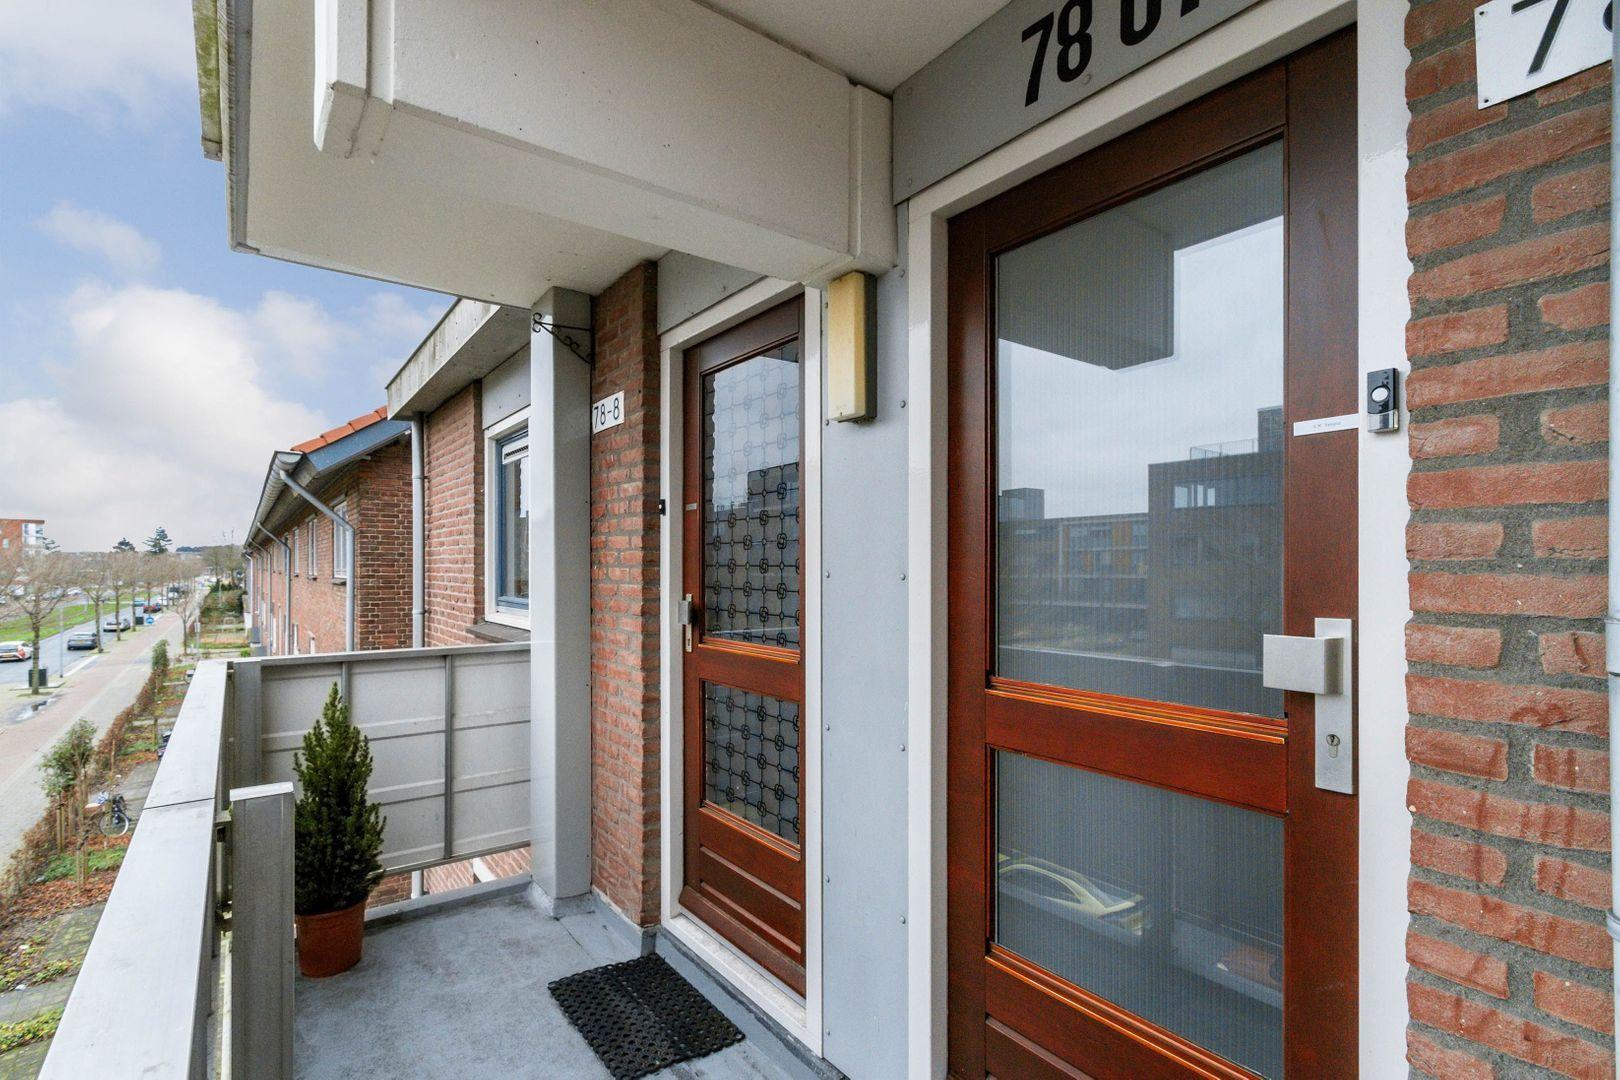 Minckelersstraat 78 8, Hilversum foto-1 blur